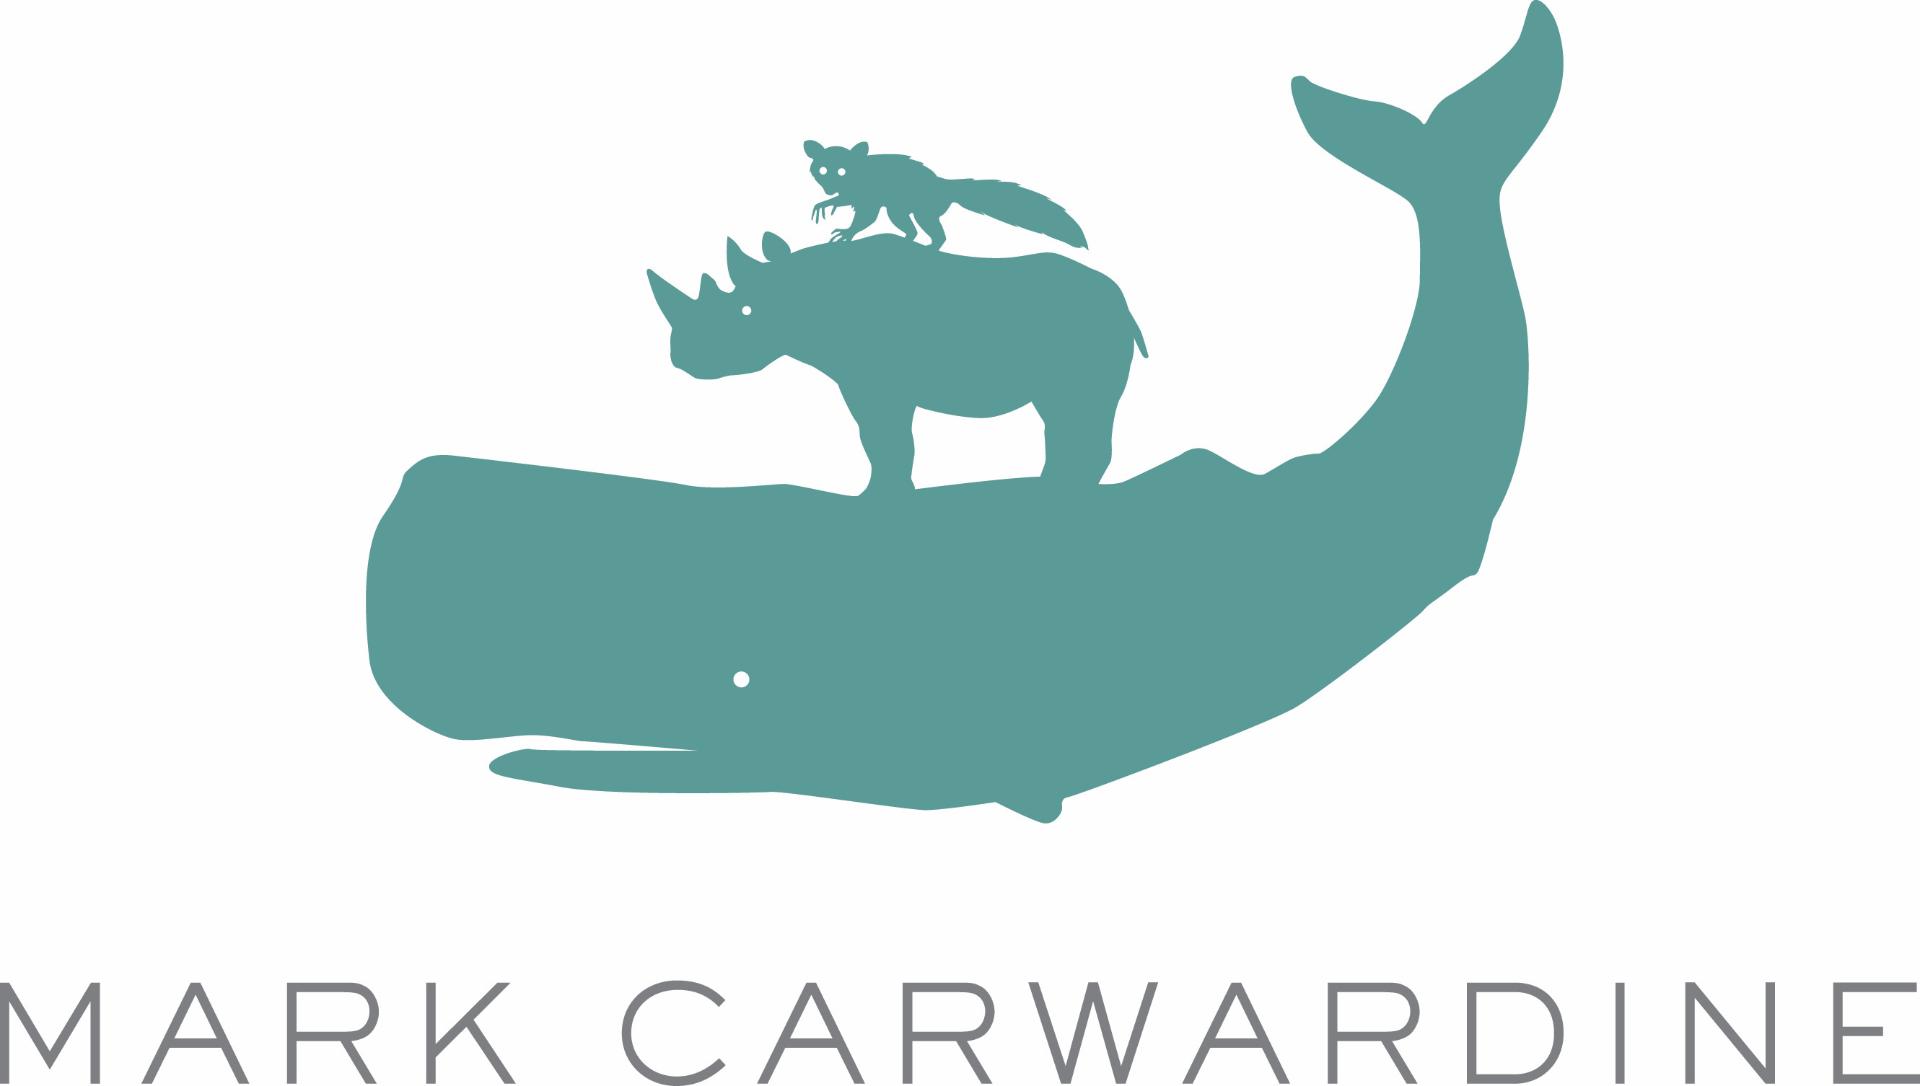 mark carwardine logo